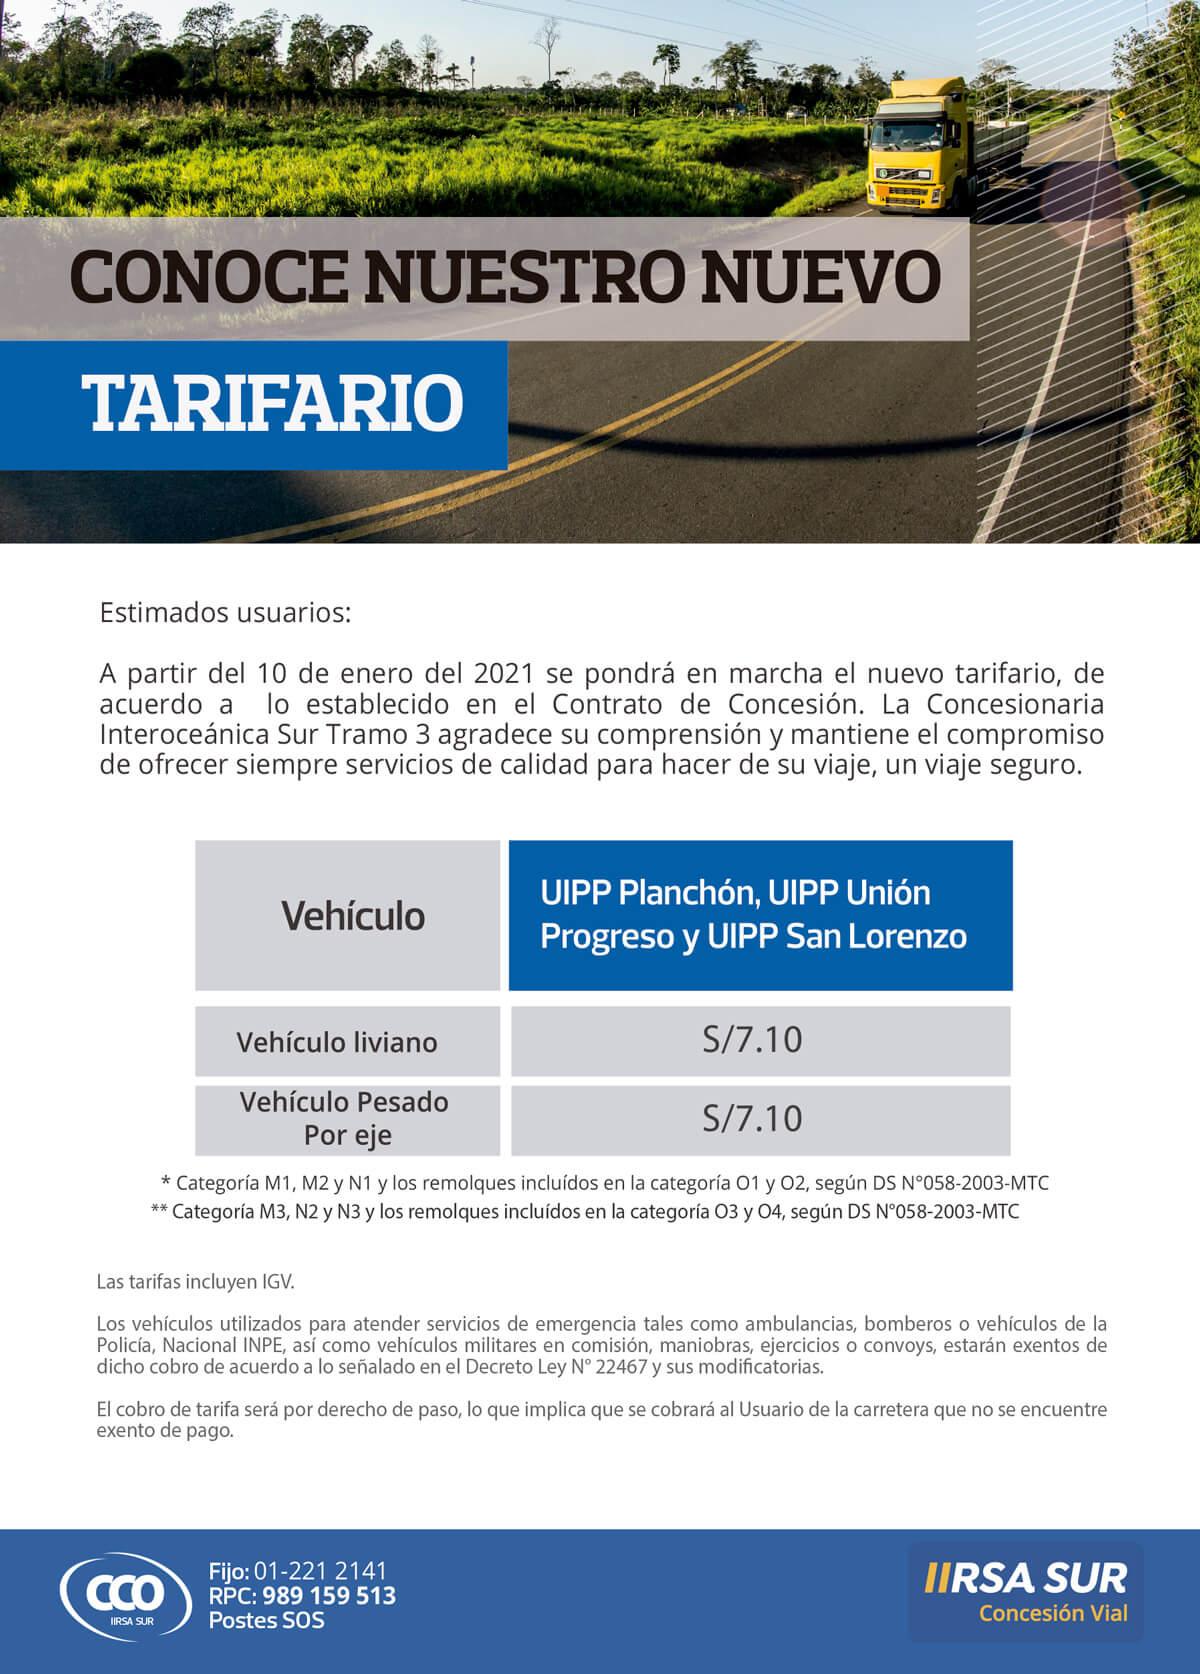 Tarifario-peajes_TARIFARIO-A5